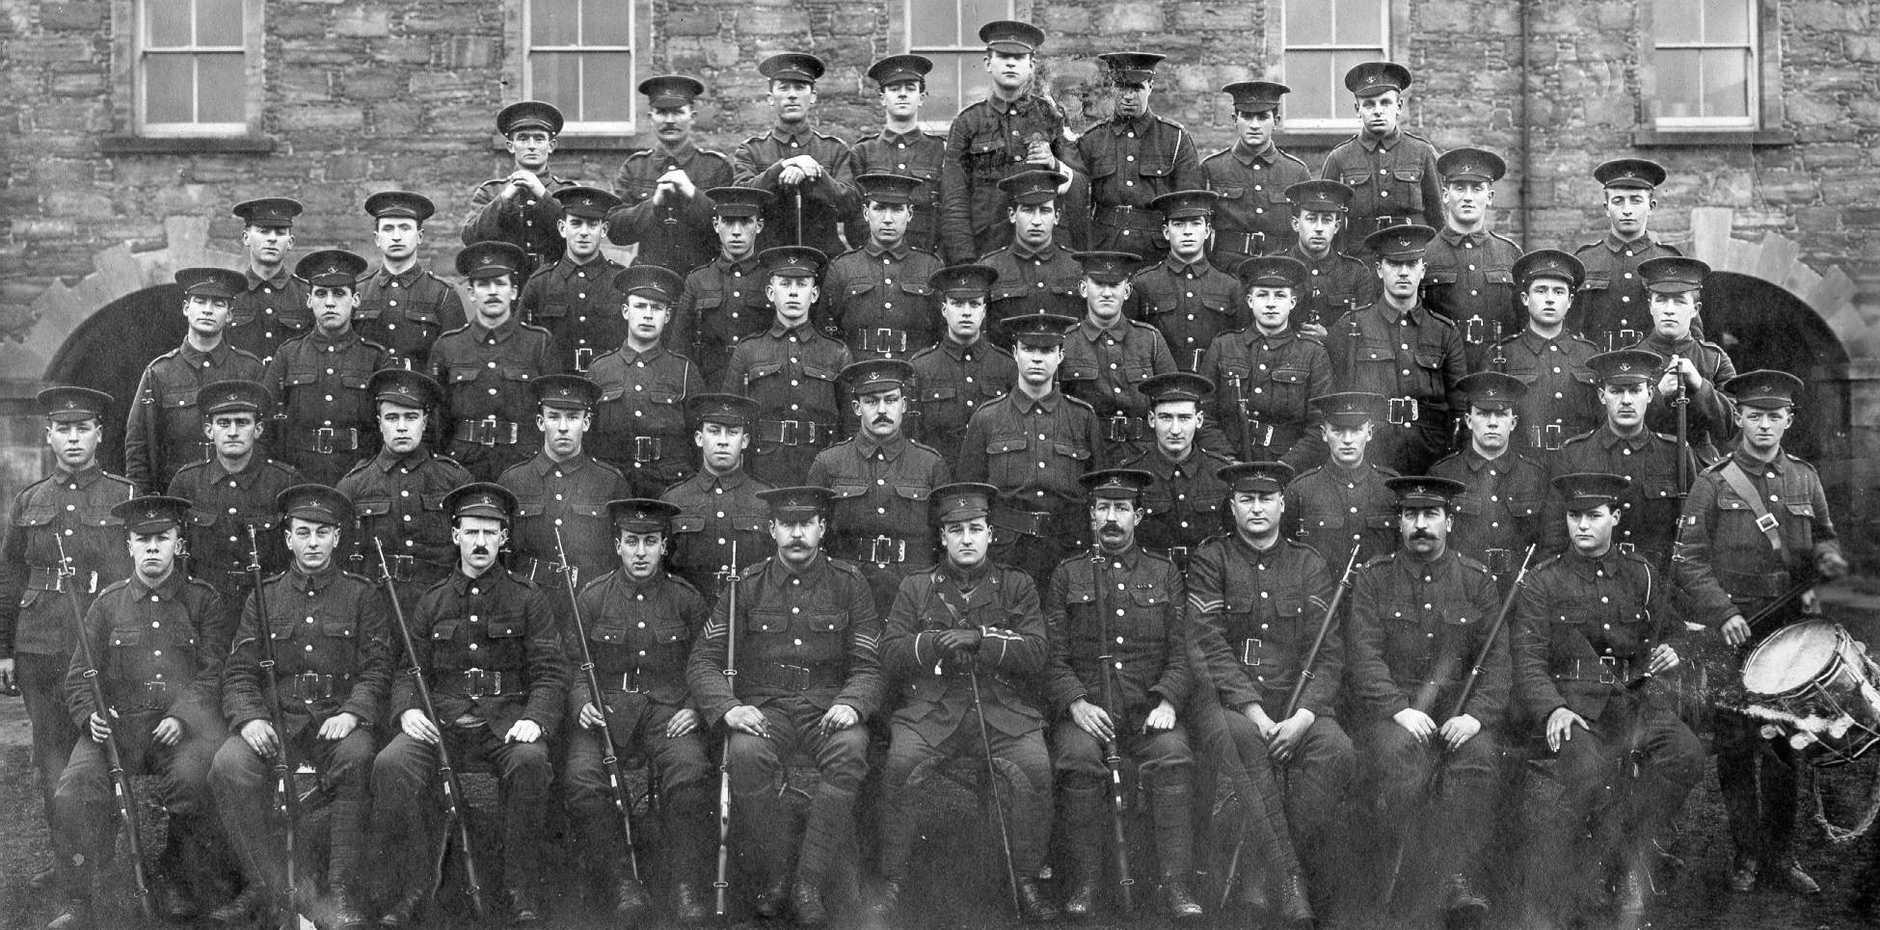 A photo of the Newfoundland Regiment